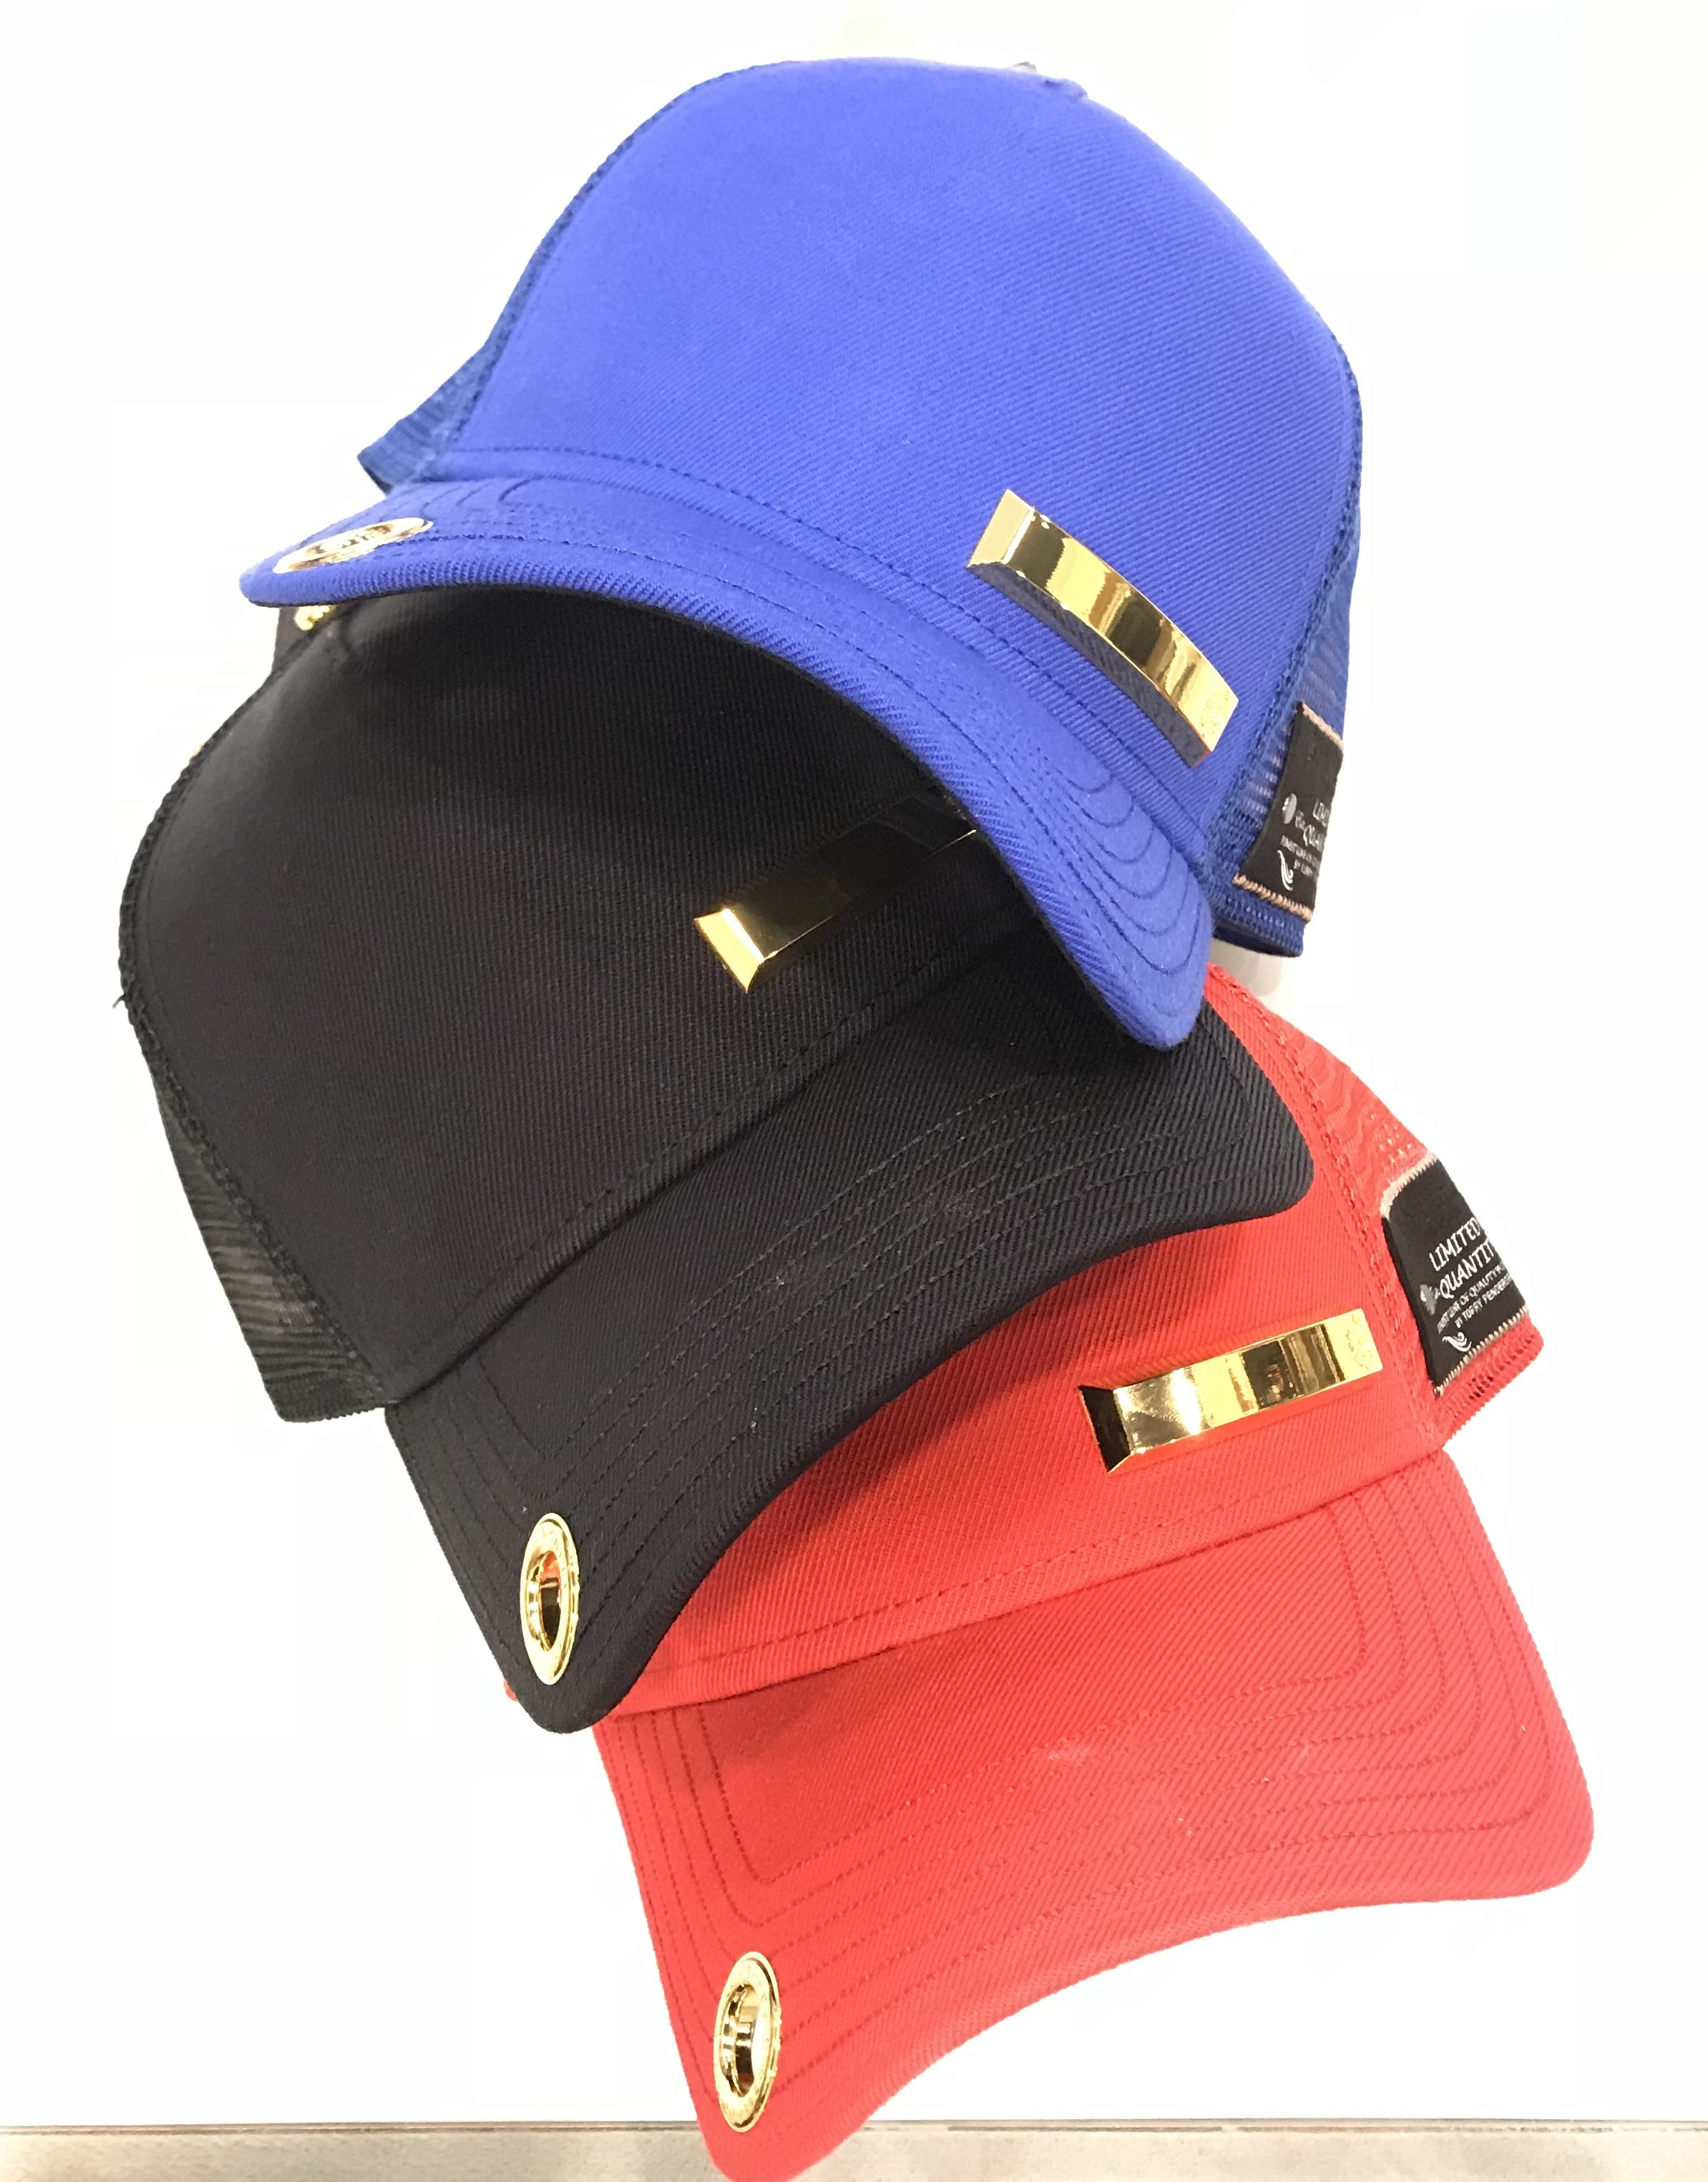 Accessories Hats Caps Axisoutfitters Com Hats Monkey Hat Accessories Hats